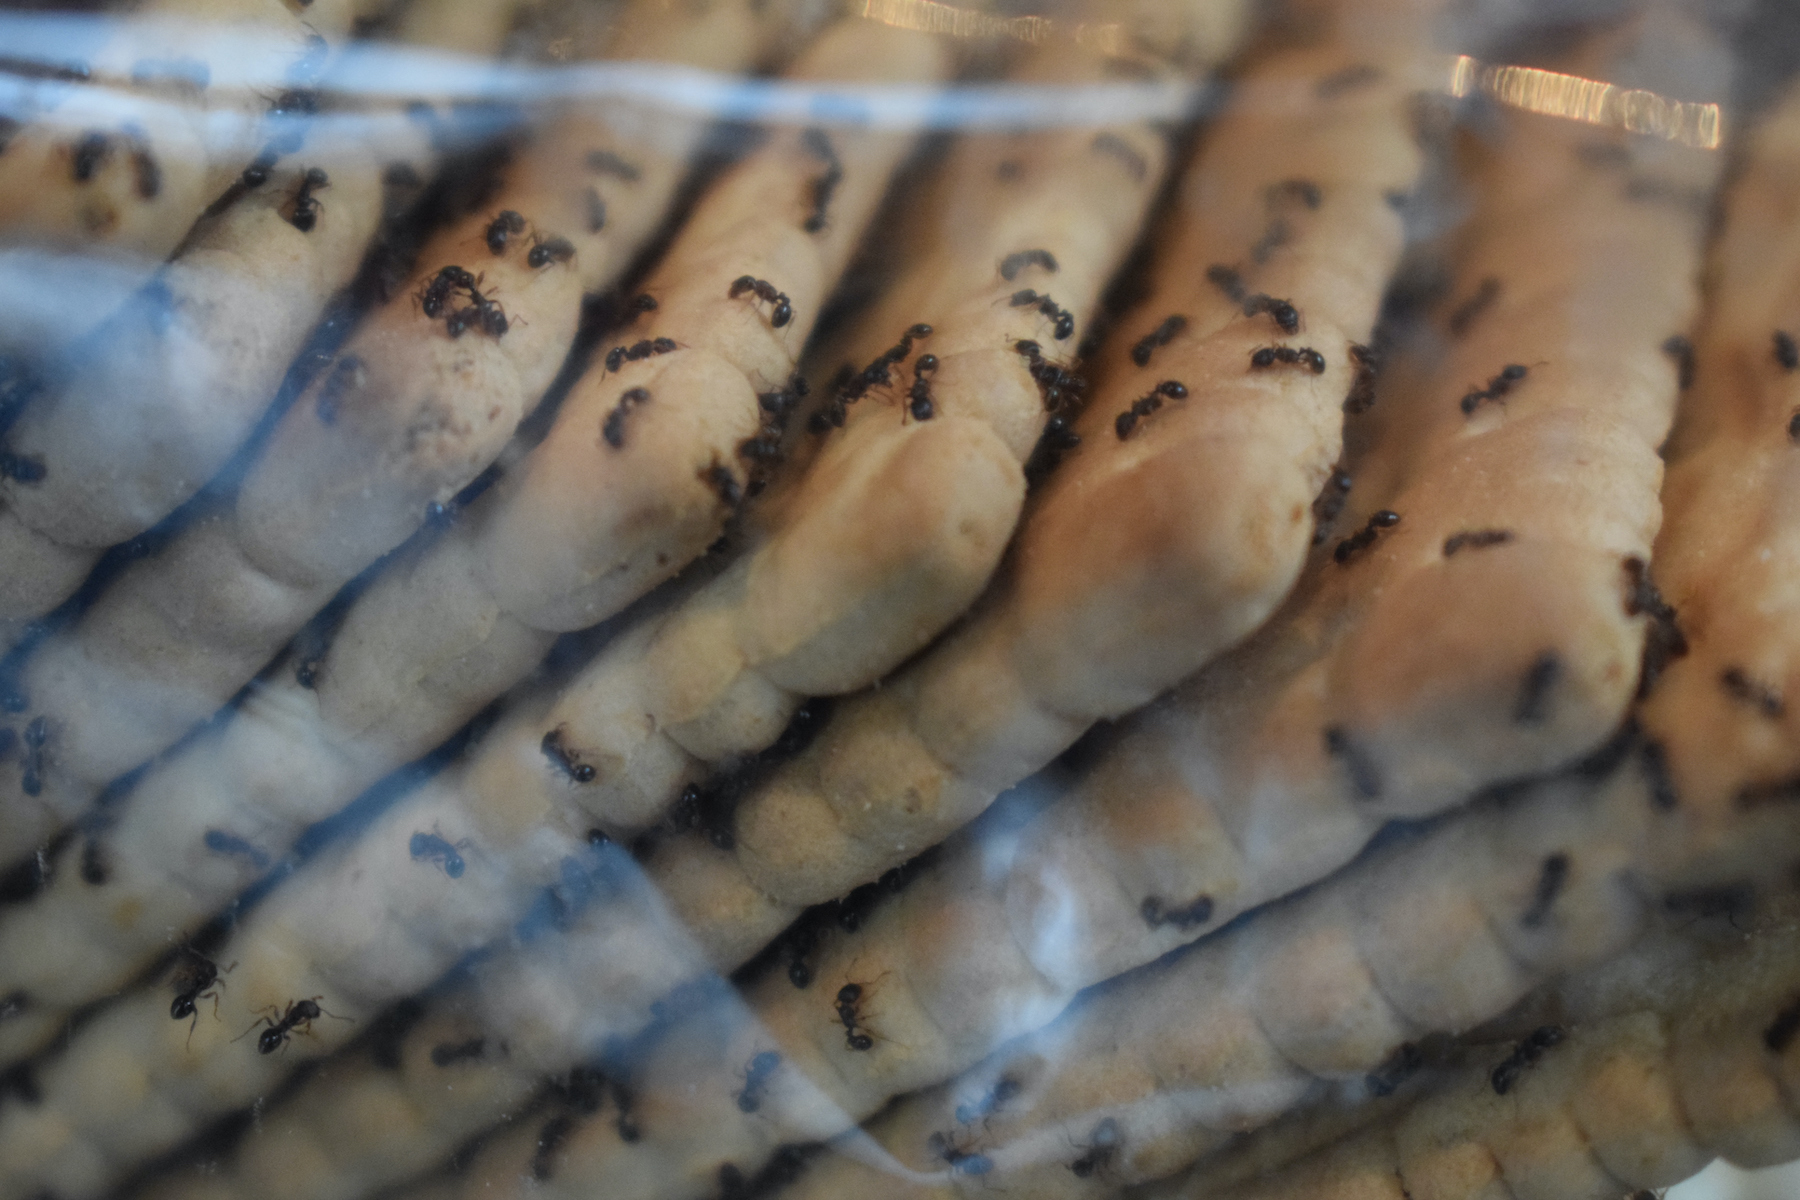 Pest Control- Ants on Food